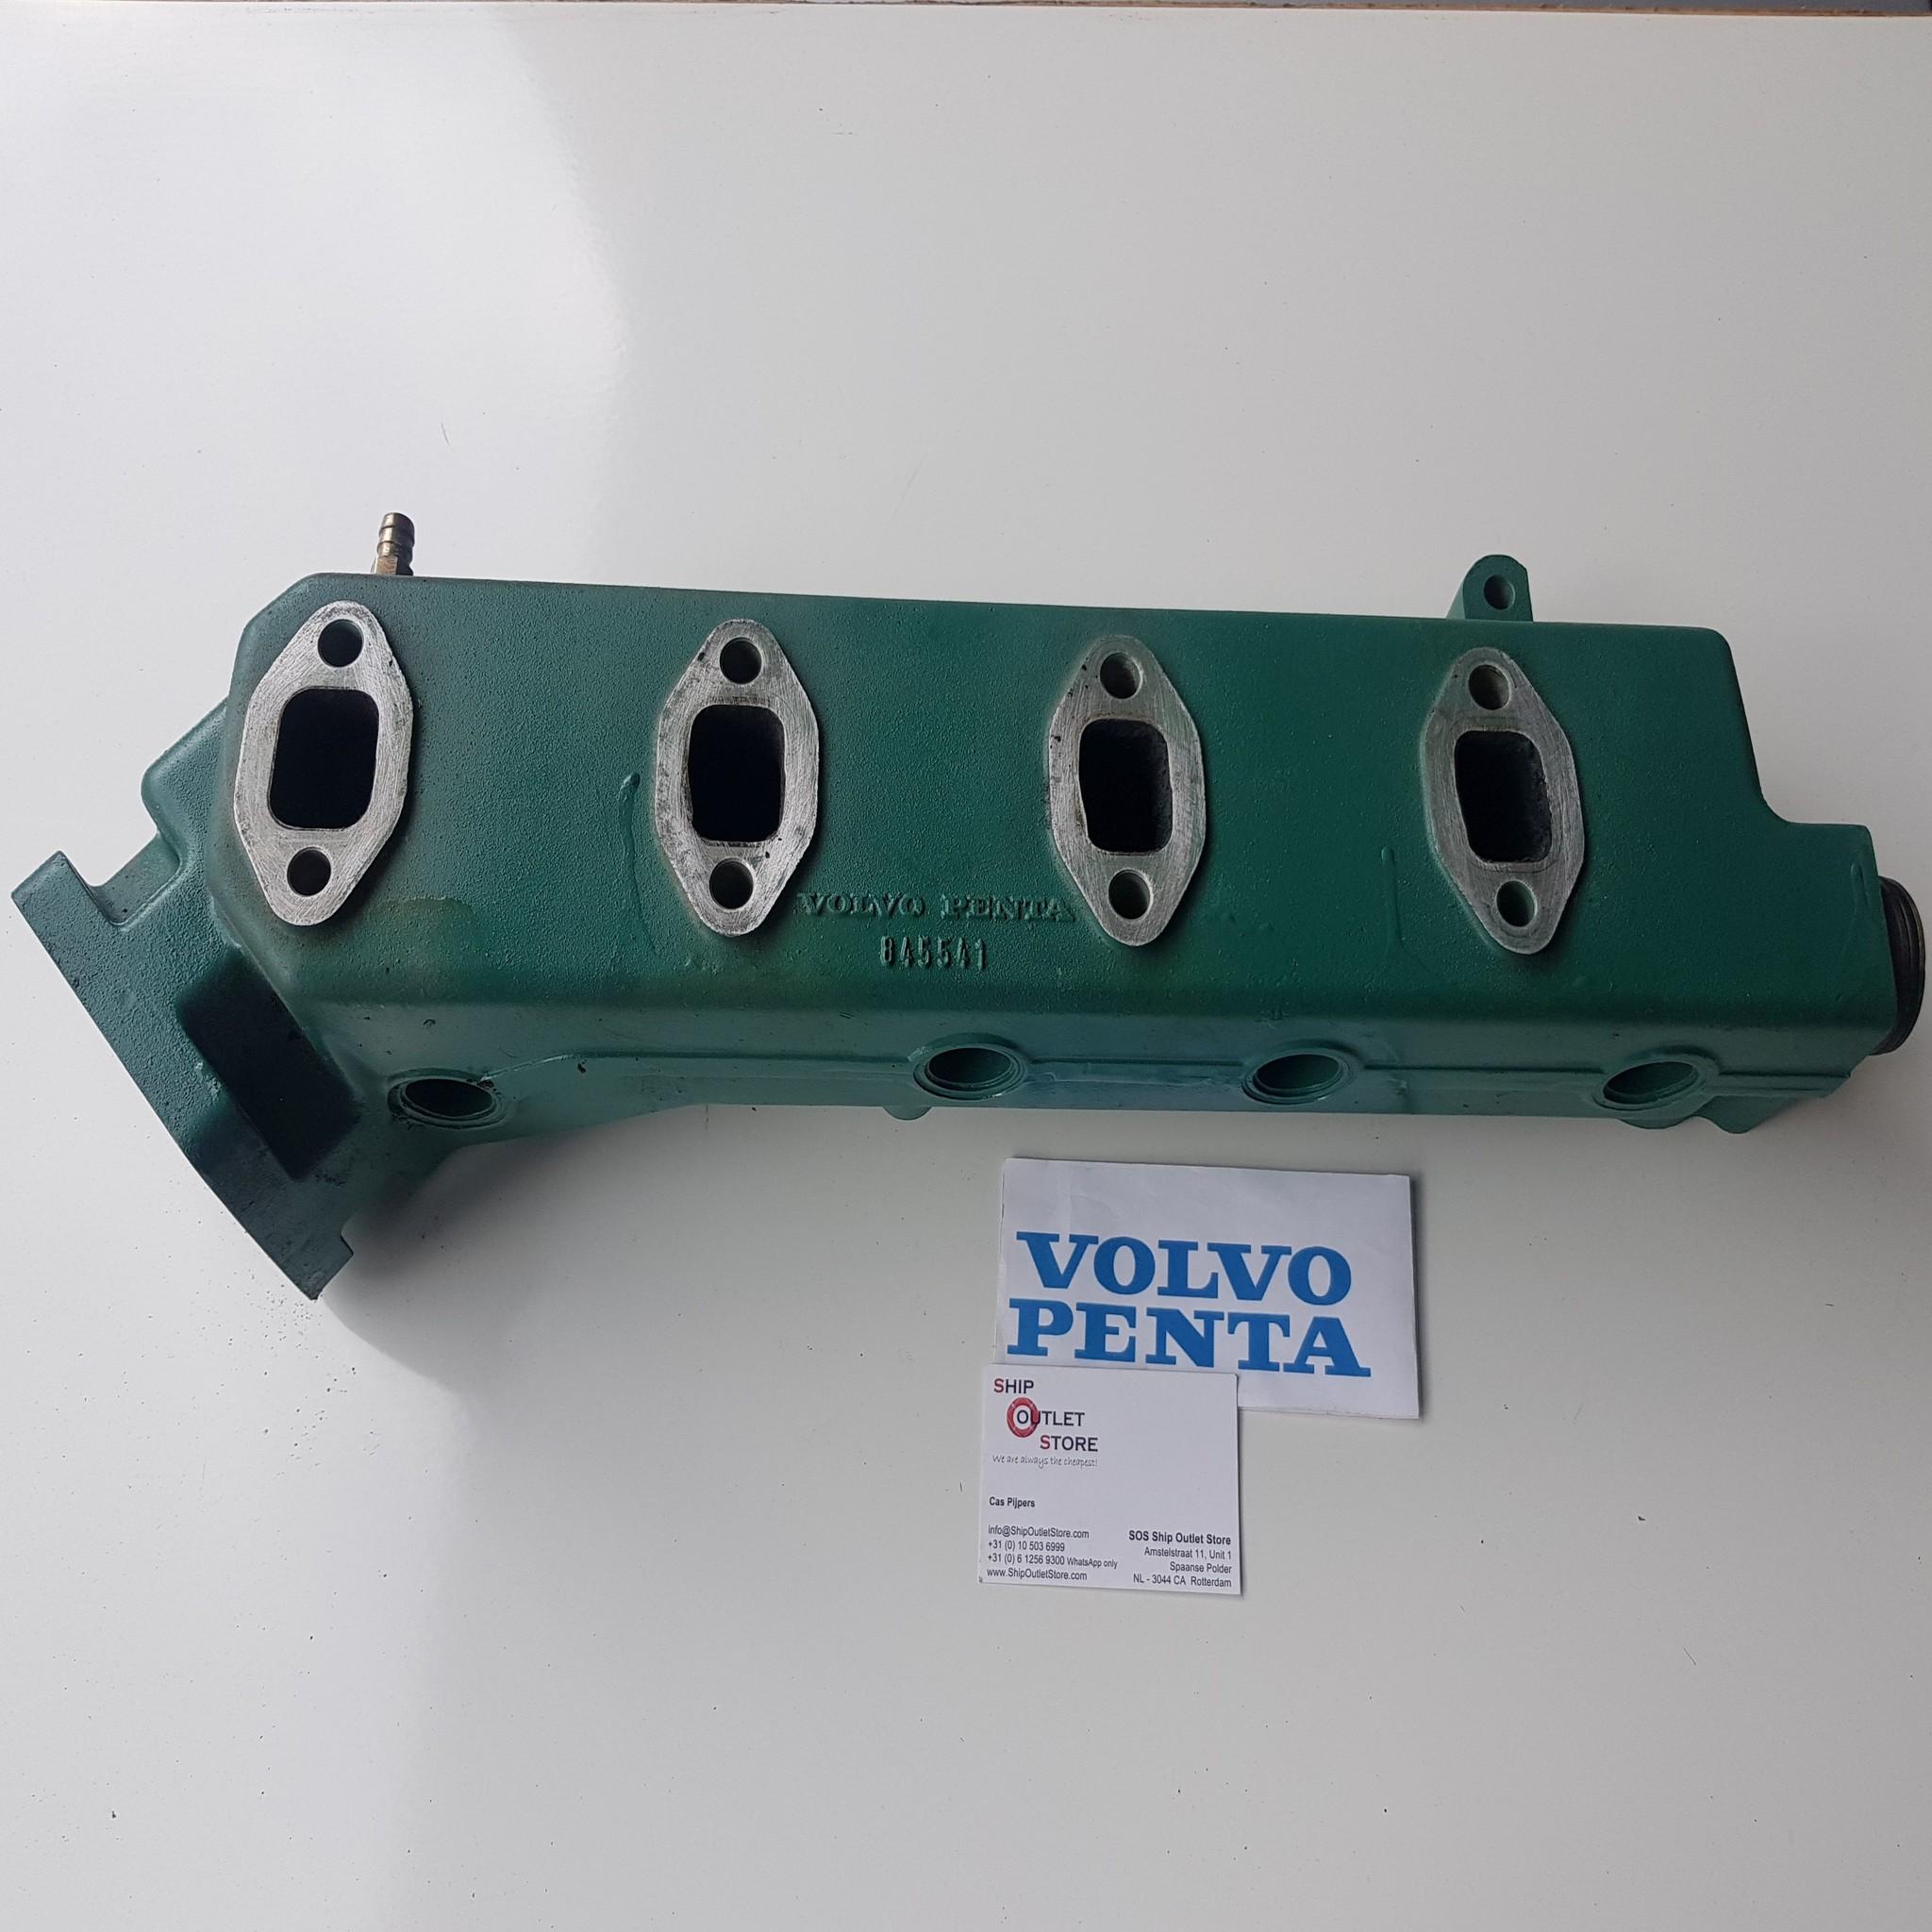 volvo penta 845541 exhaust manifold